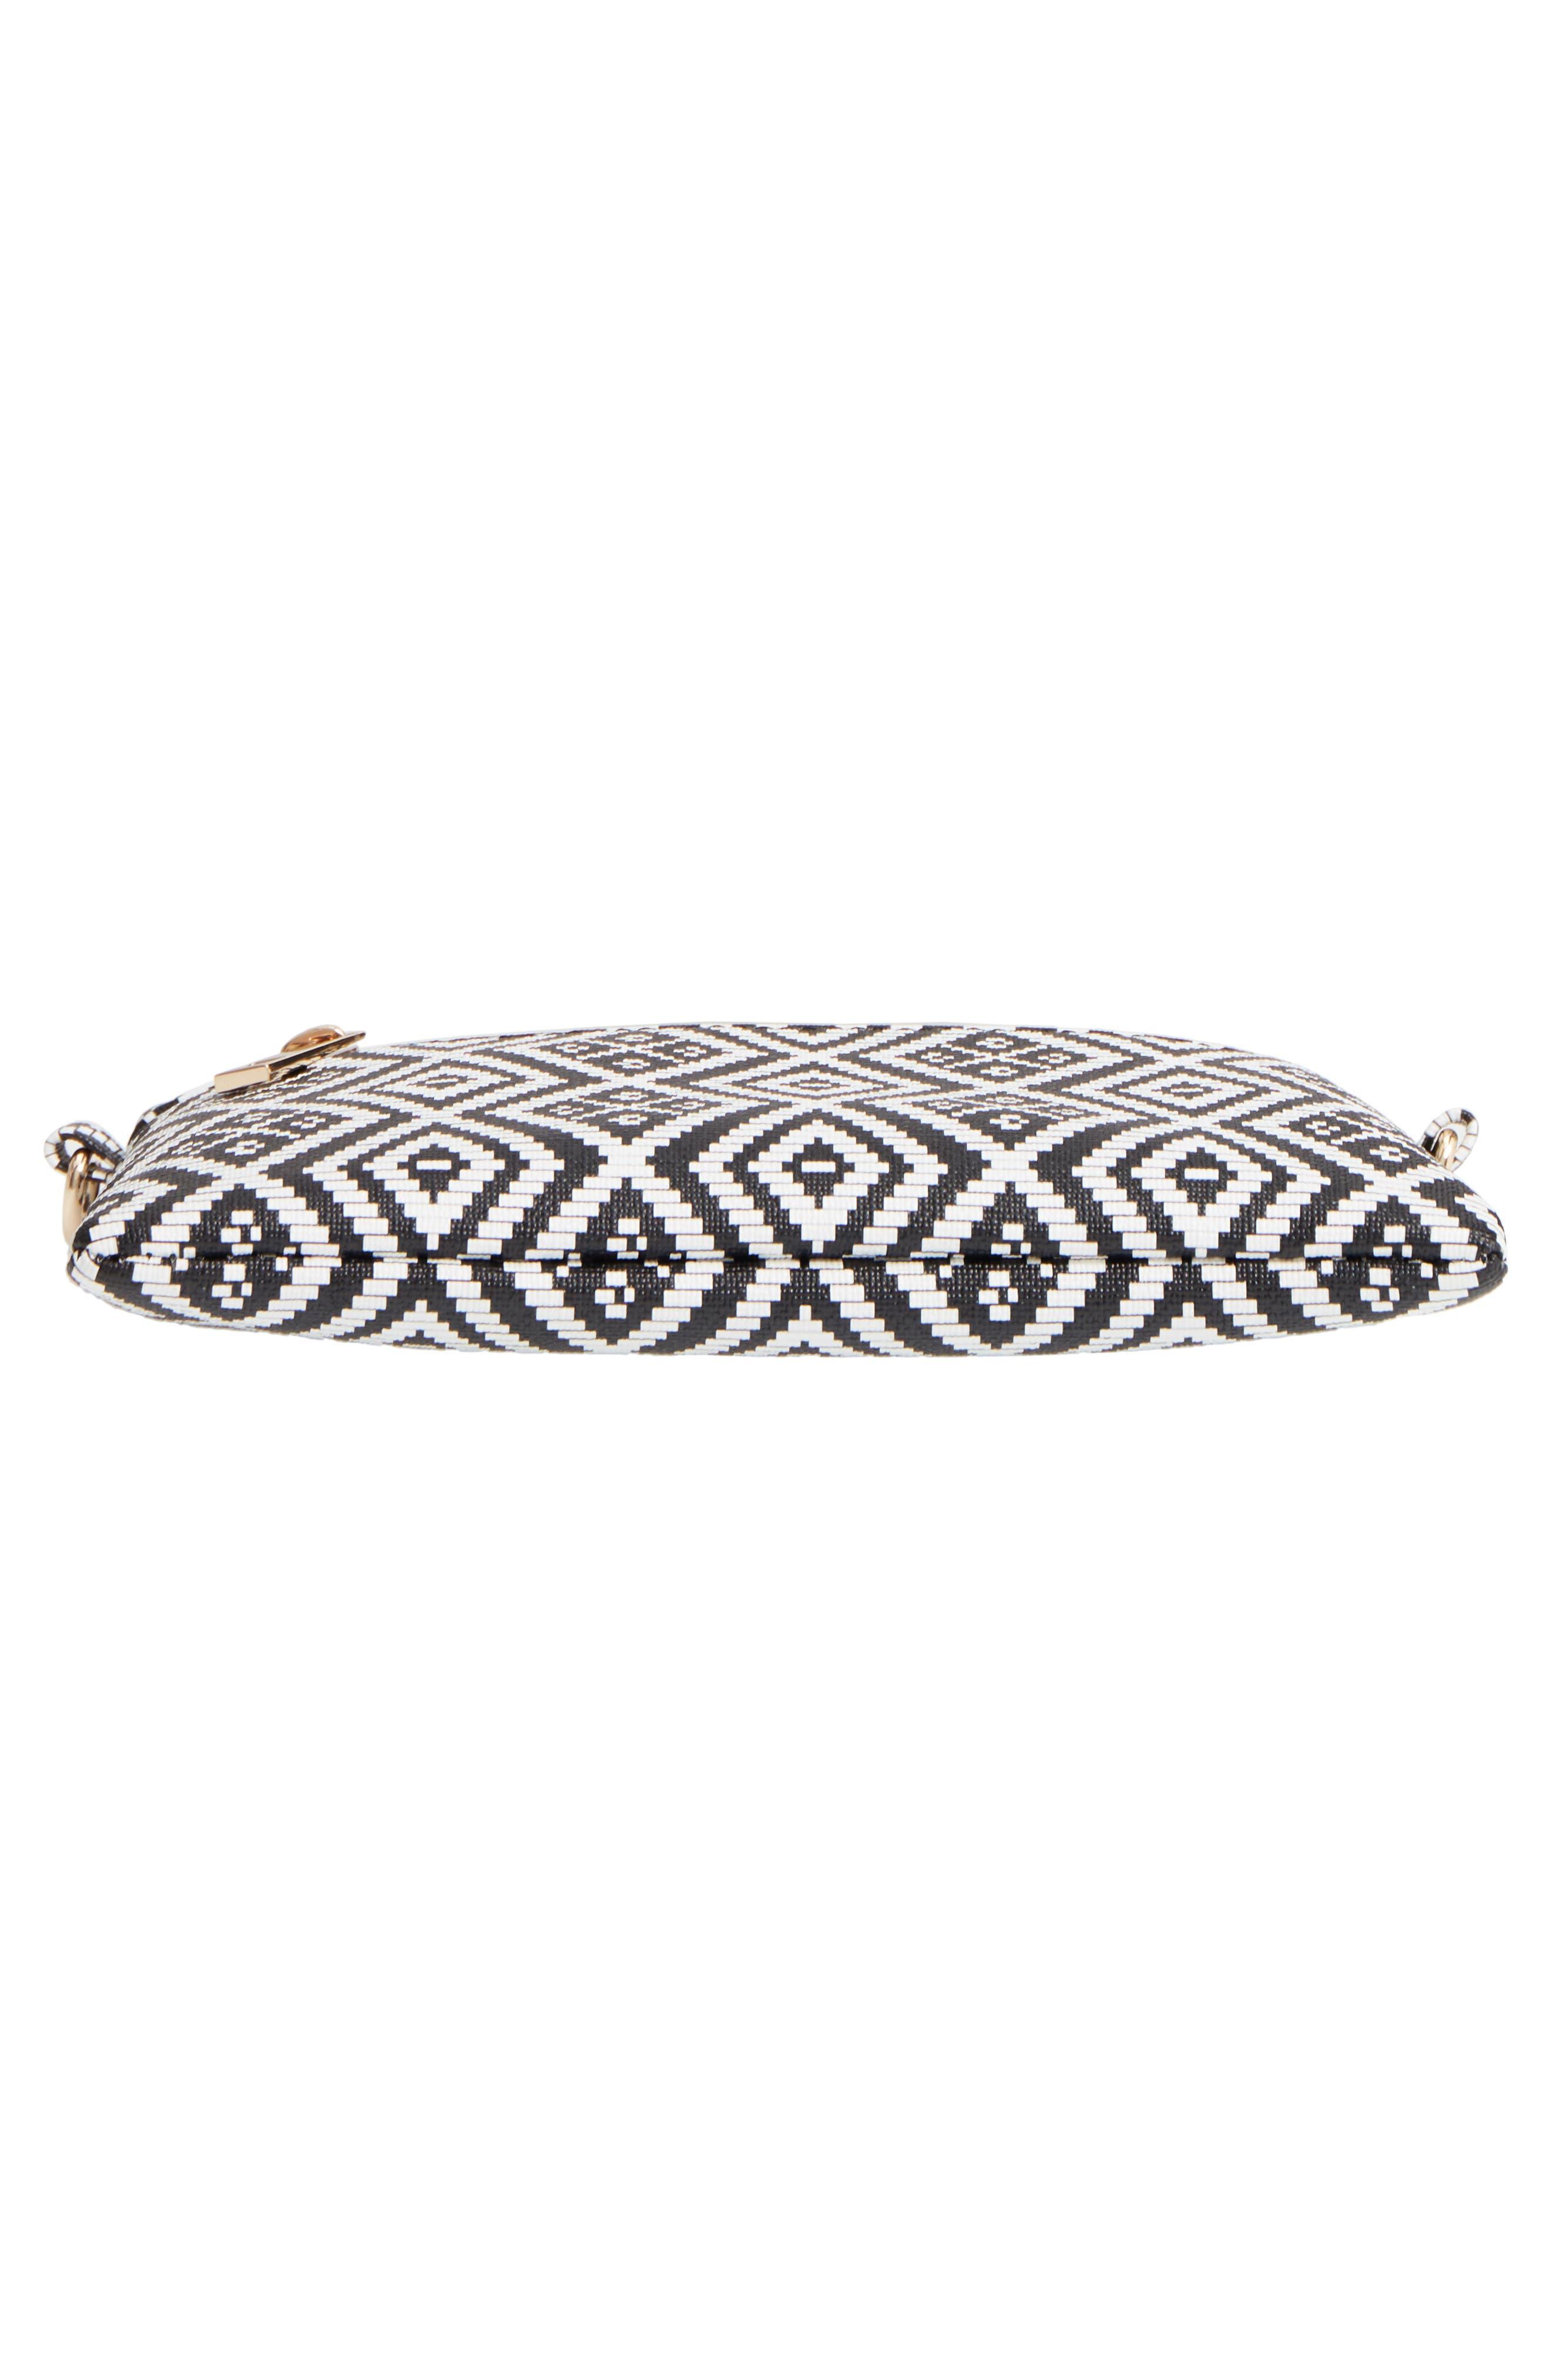 Weave Pattern Convertible Crossbody Wristlet,                             Alternate thumbnail 5, color,                             Black/ White